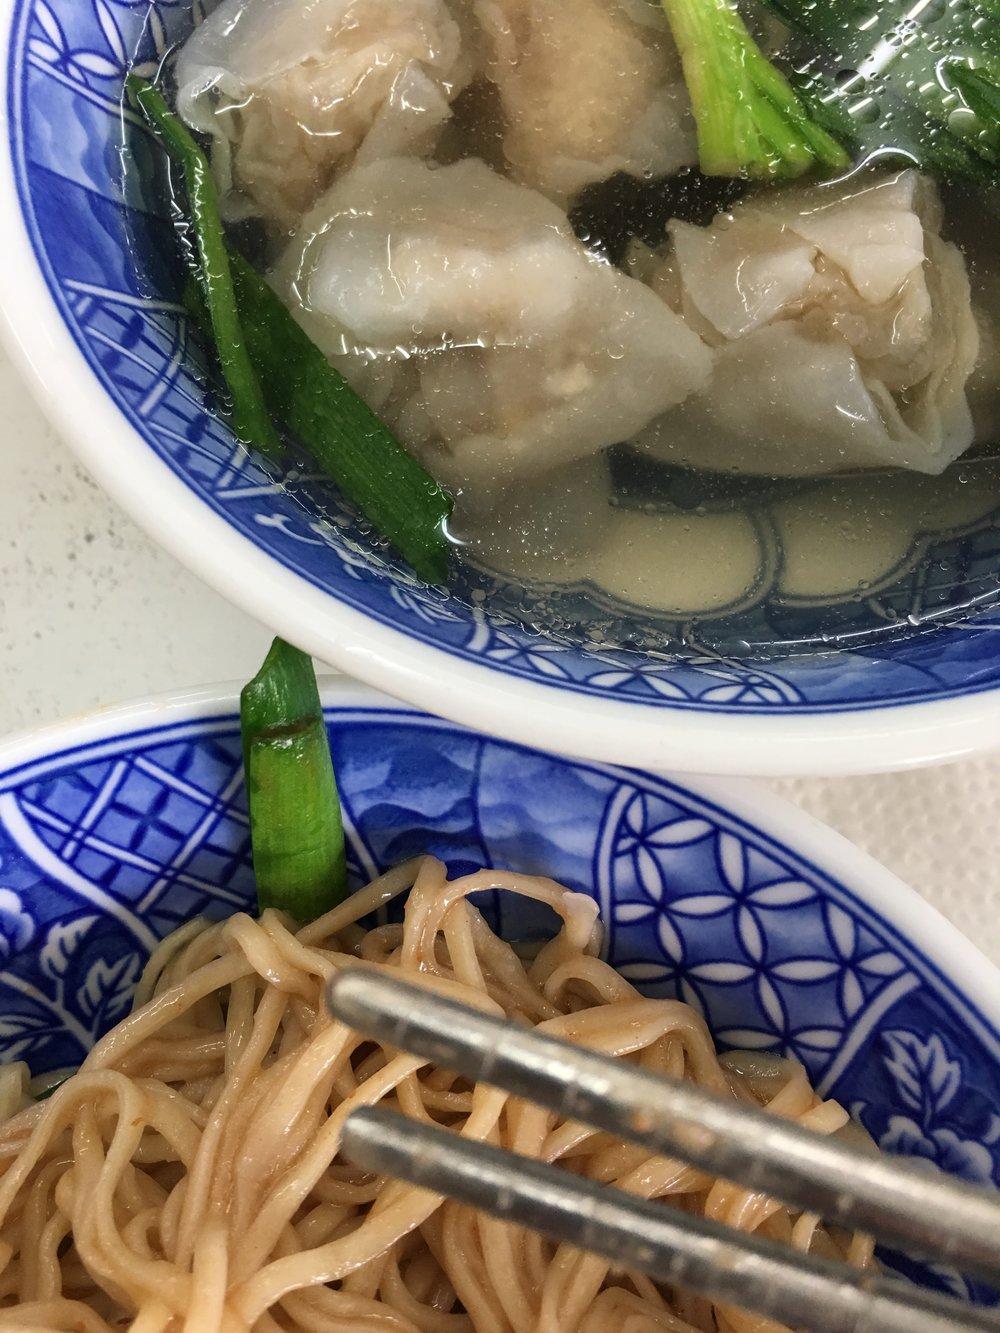 Handmade Noodles & Dumpling Soup